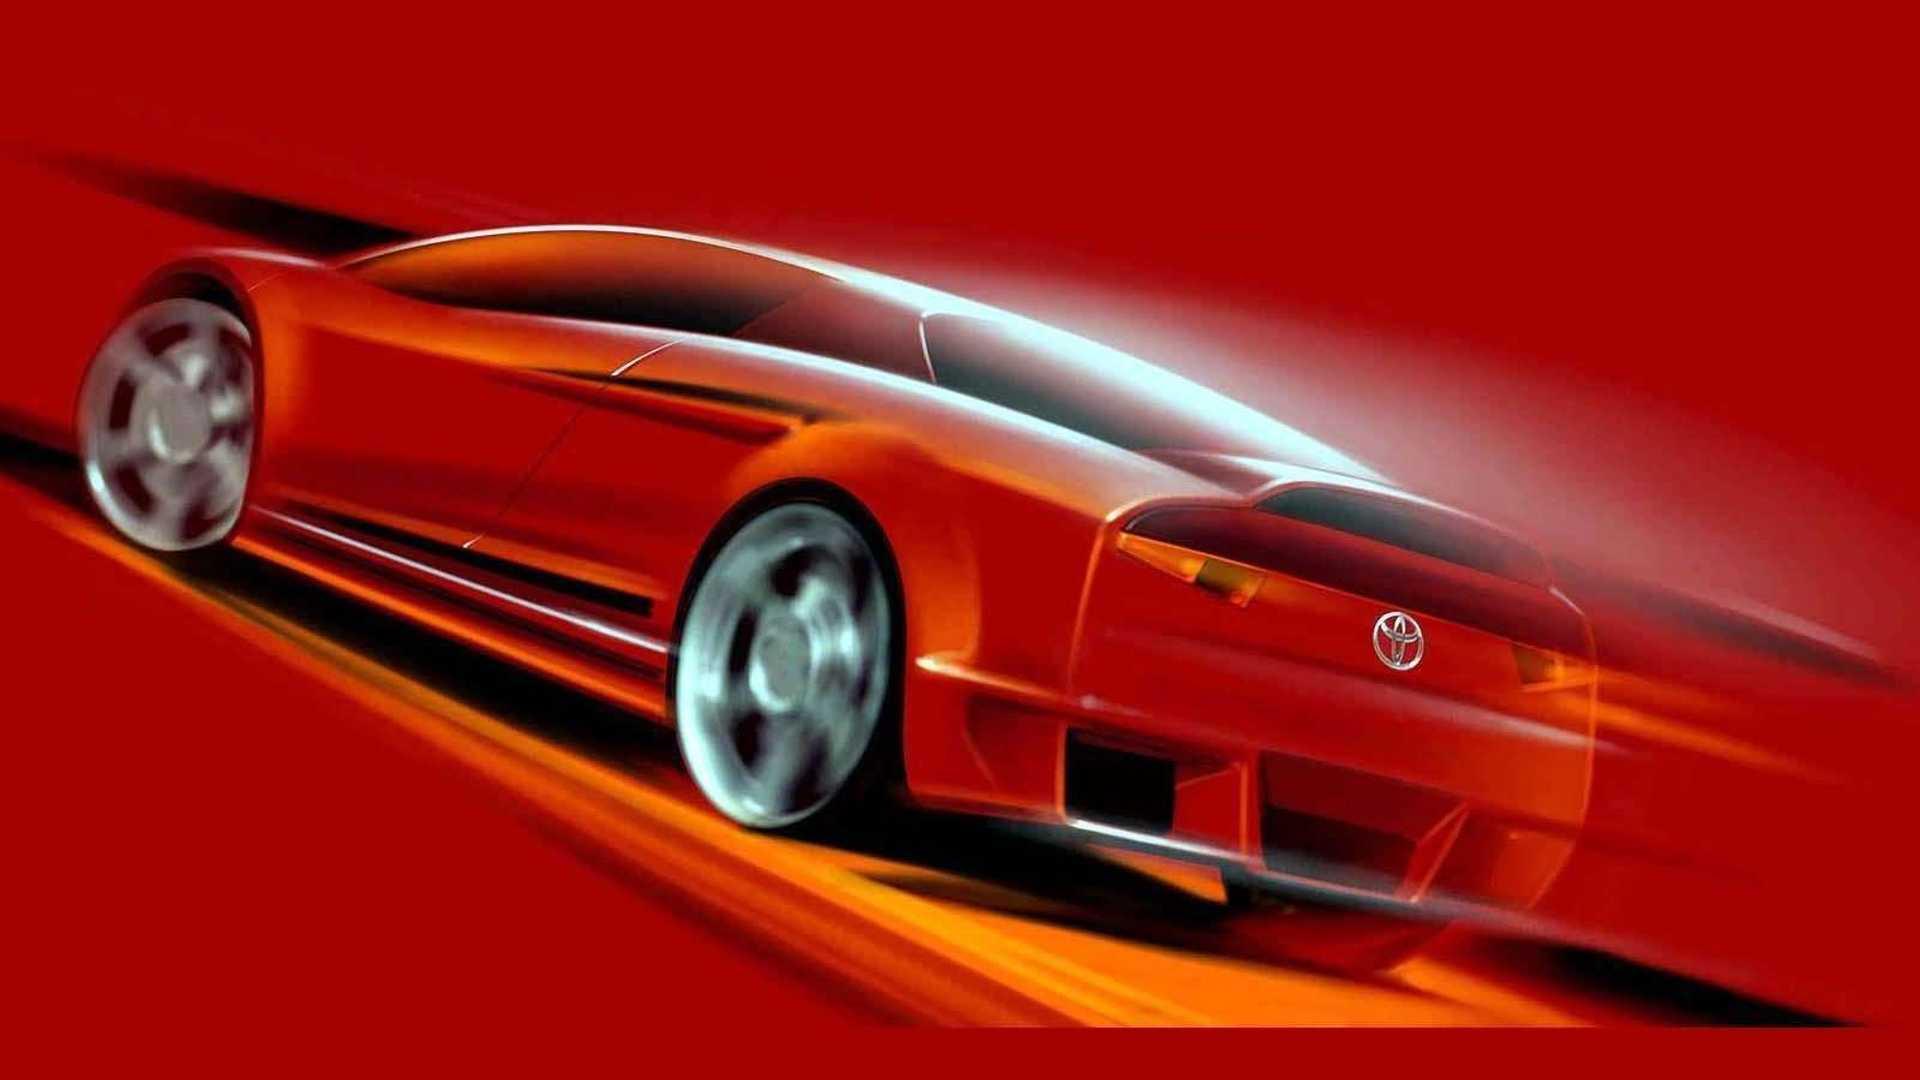 Toyota-Alessandro-Volta-concept-2004-27